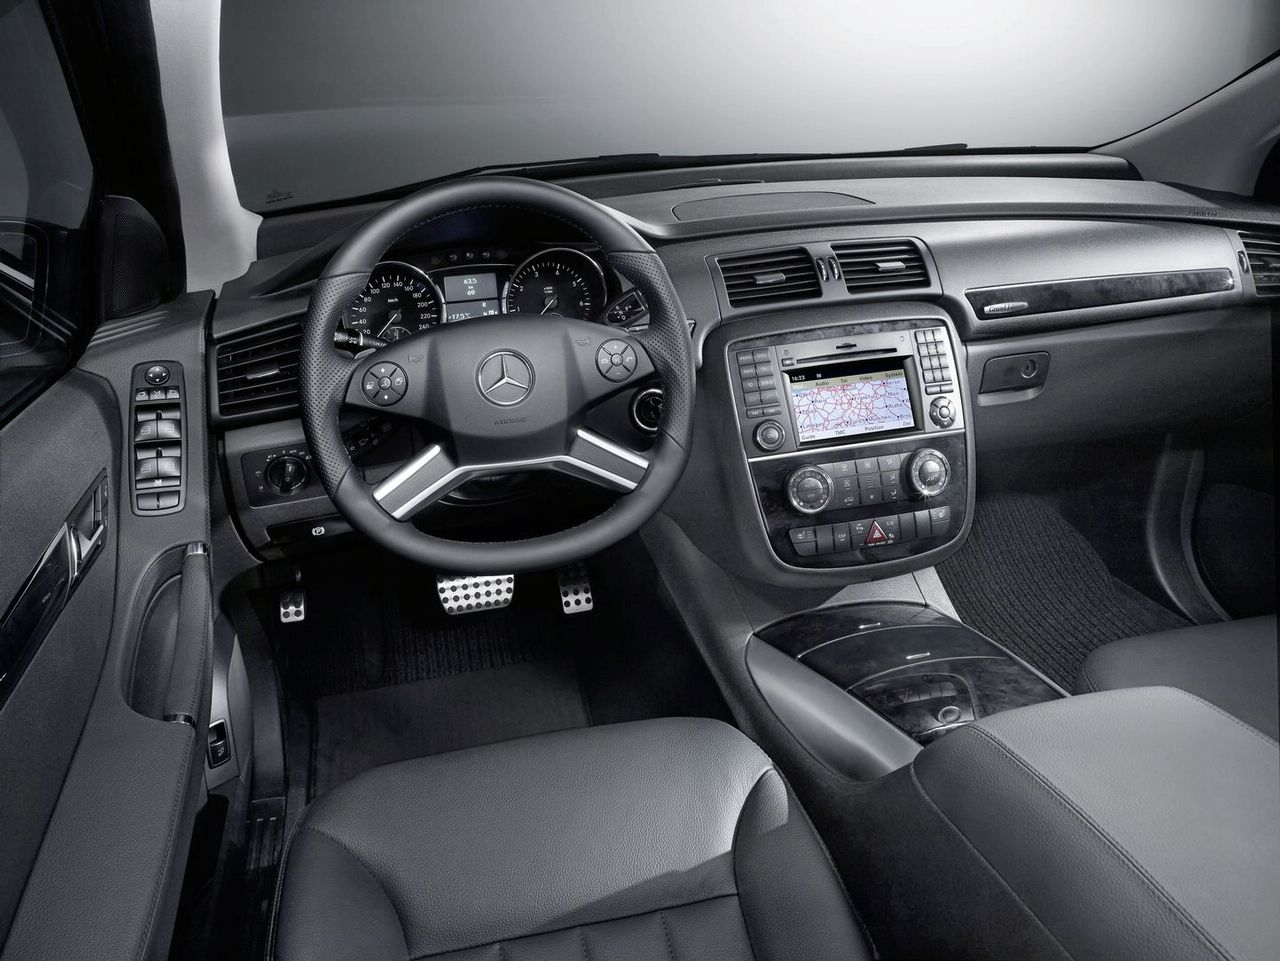 MERCEDES-BENZ R-CLASS interior